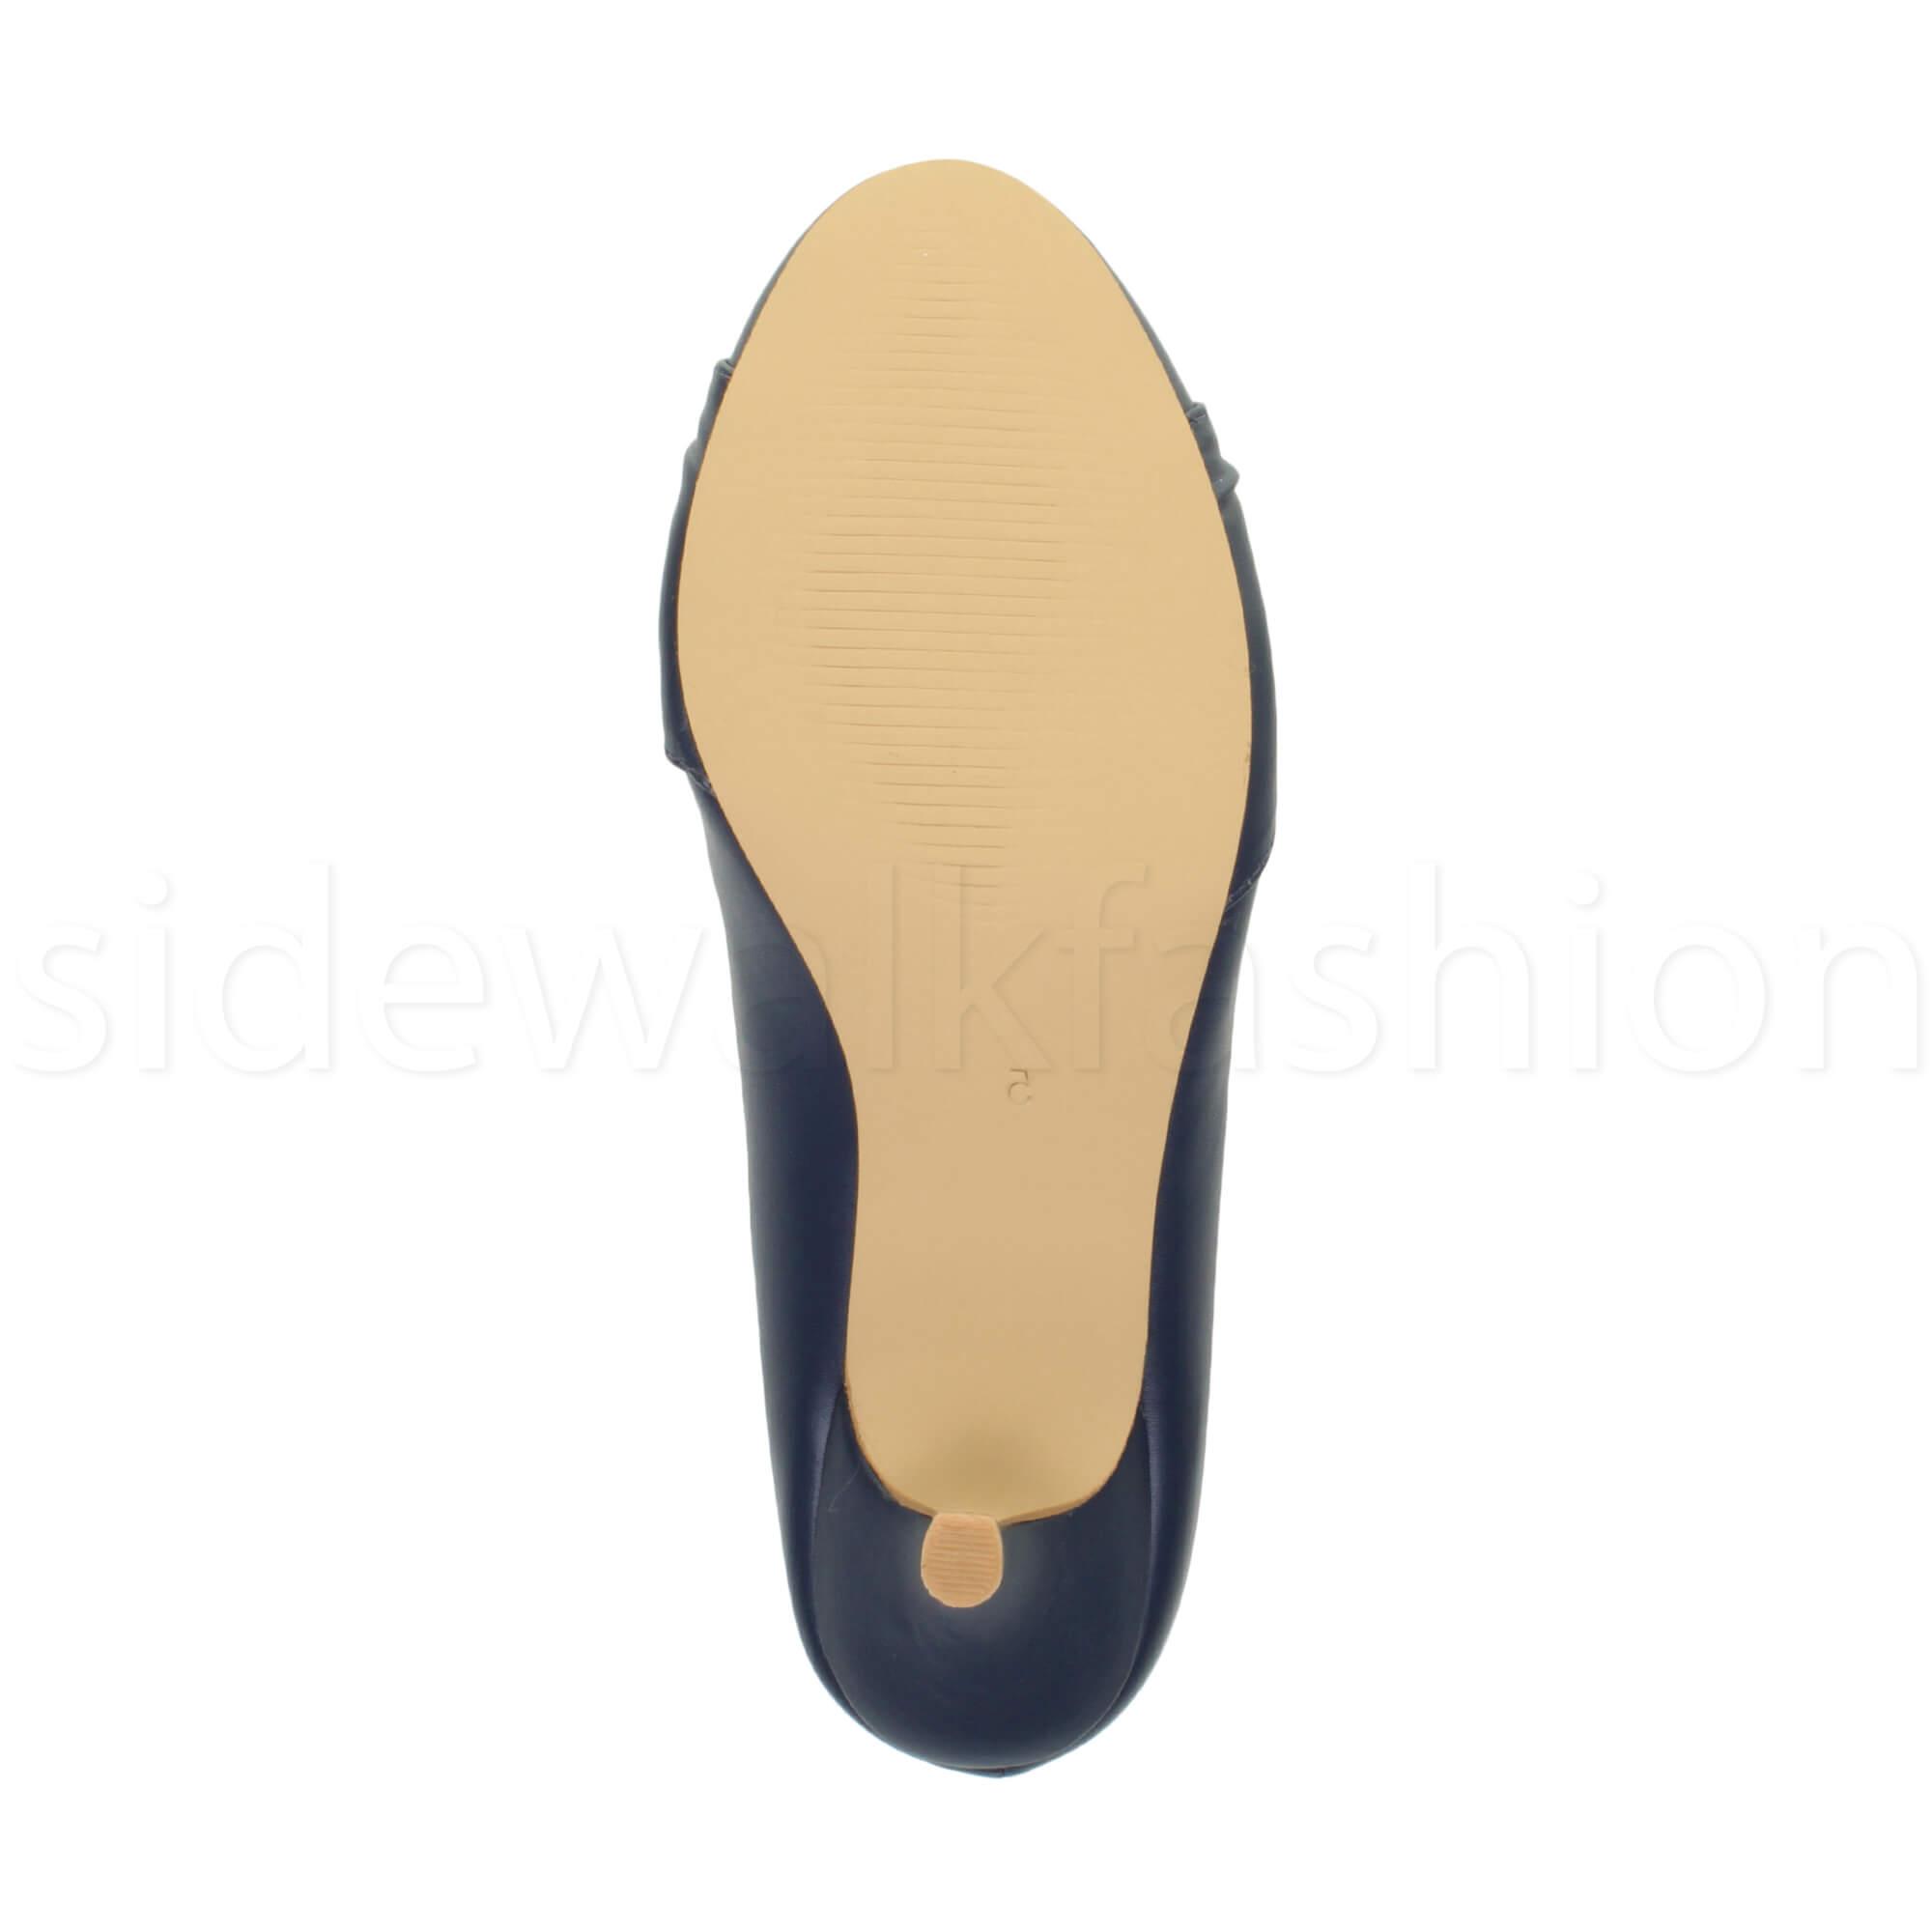 Womens-ladies-low-mid-heel-diamante-party-smart-evening-court-shoes-size thumbnail 49